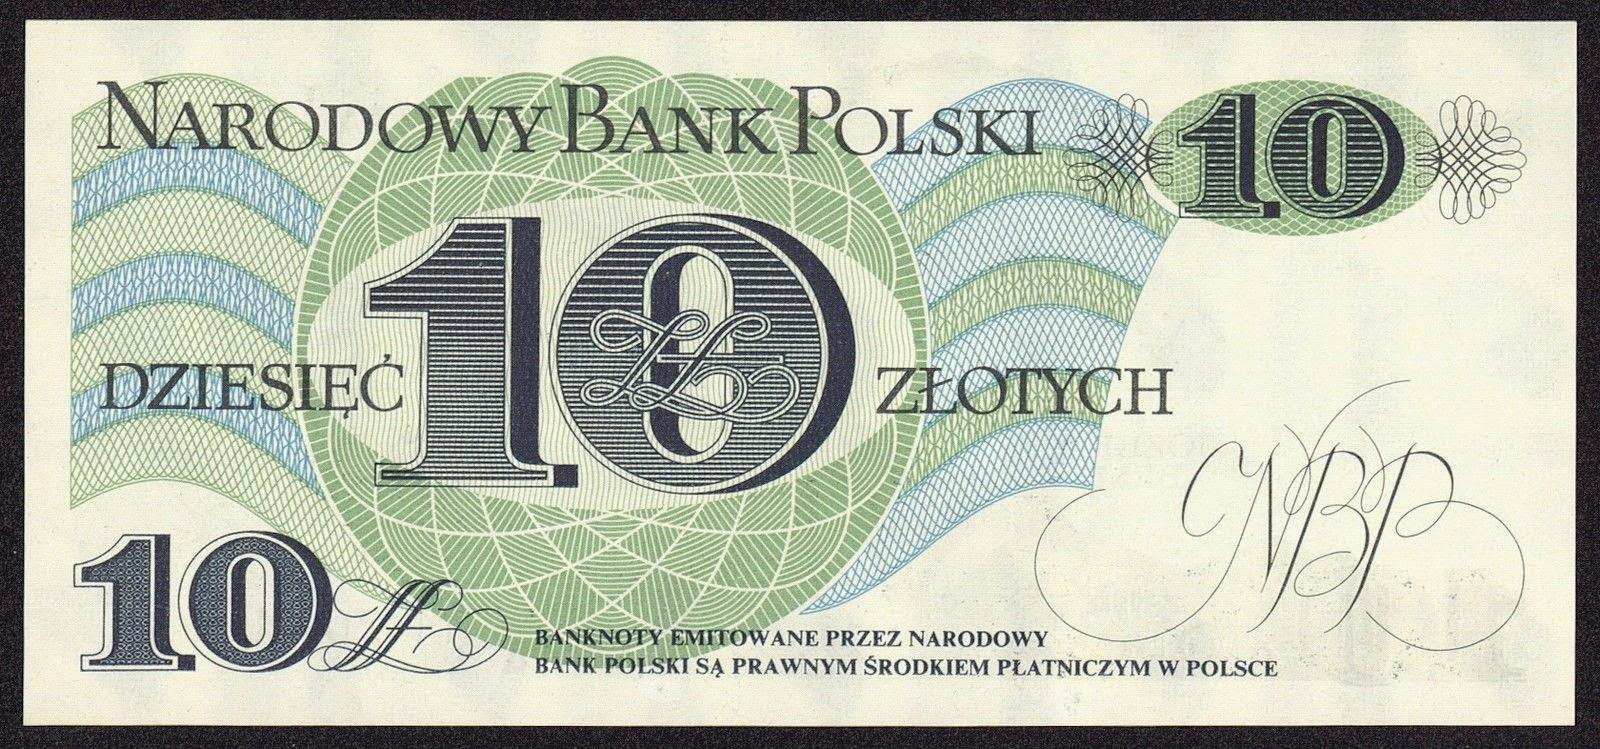 10 Zloty banknote 1982